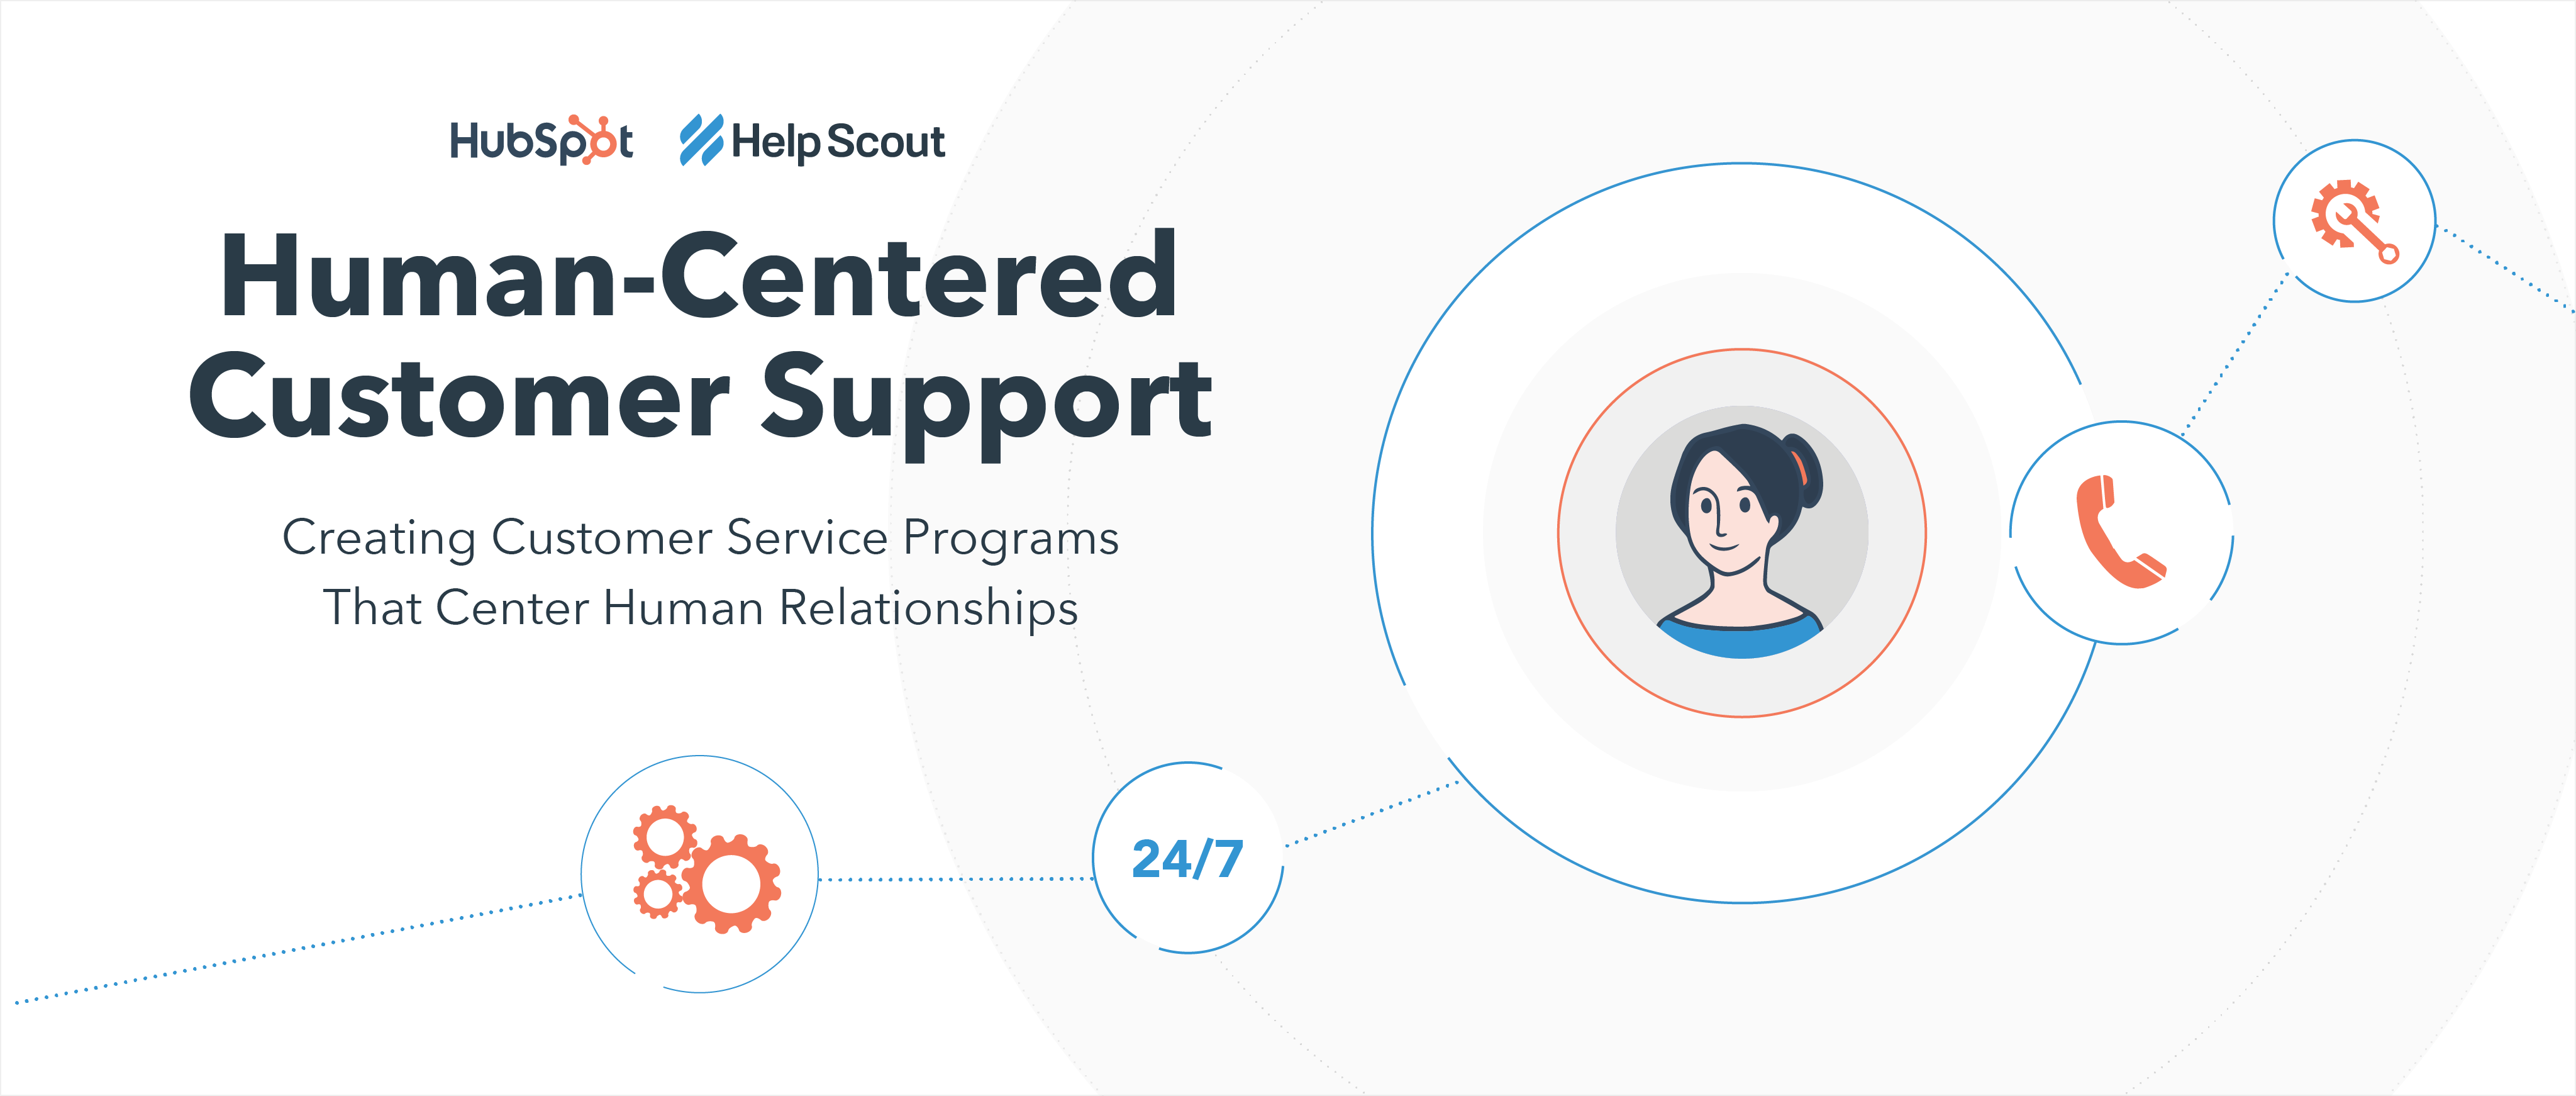 Human-Centered Customer Support